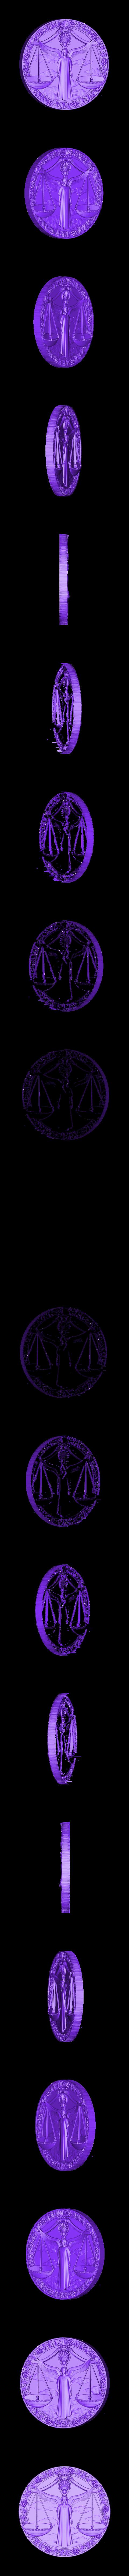 2.stl Download free STL file Zodiac sign • 3D printing design, 3DPrinterFiles